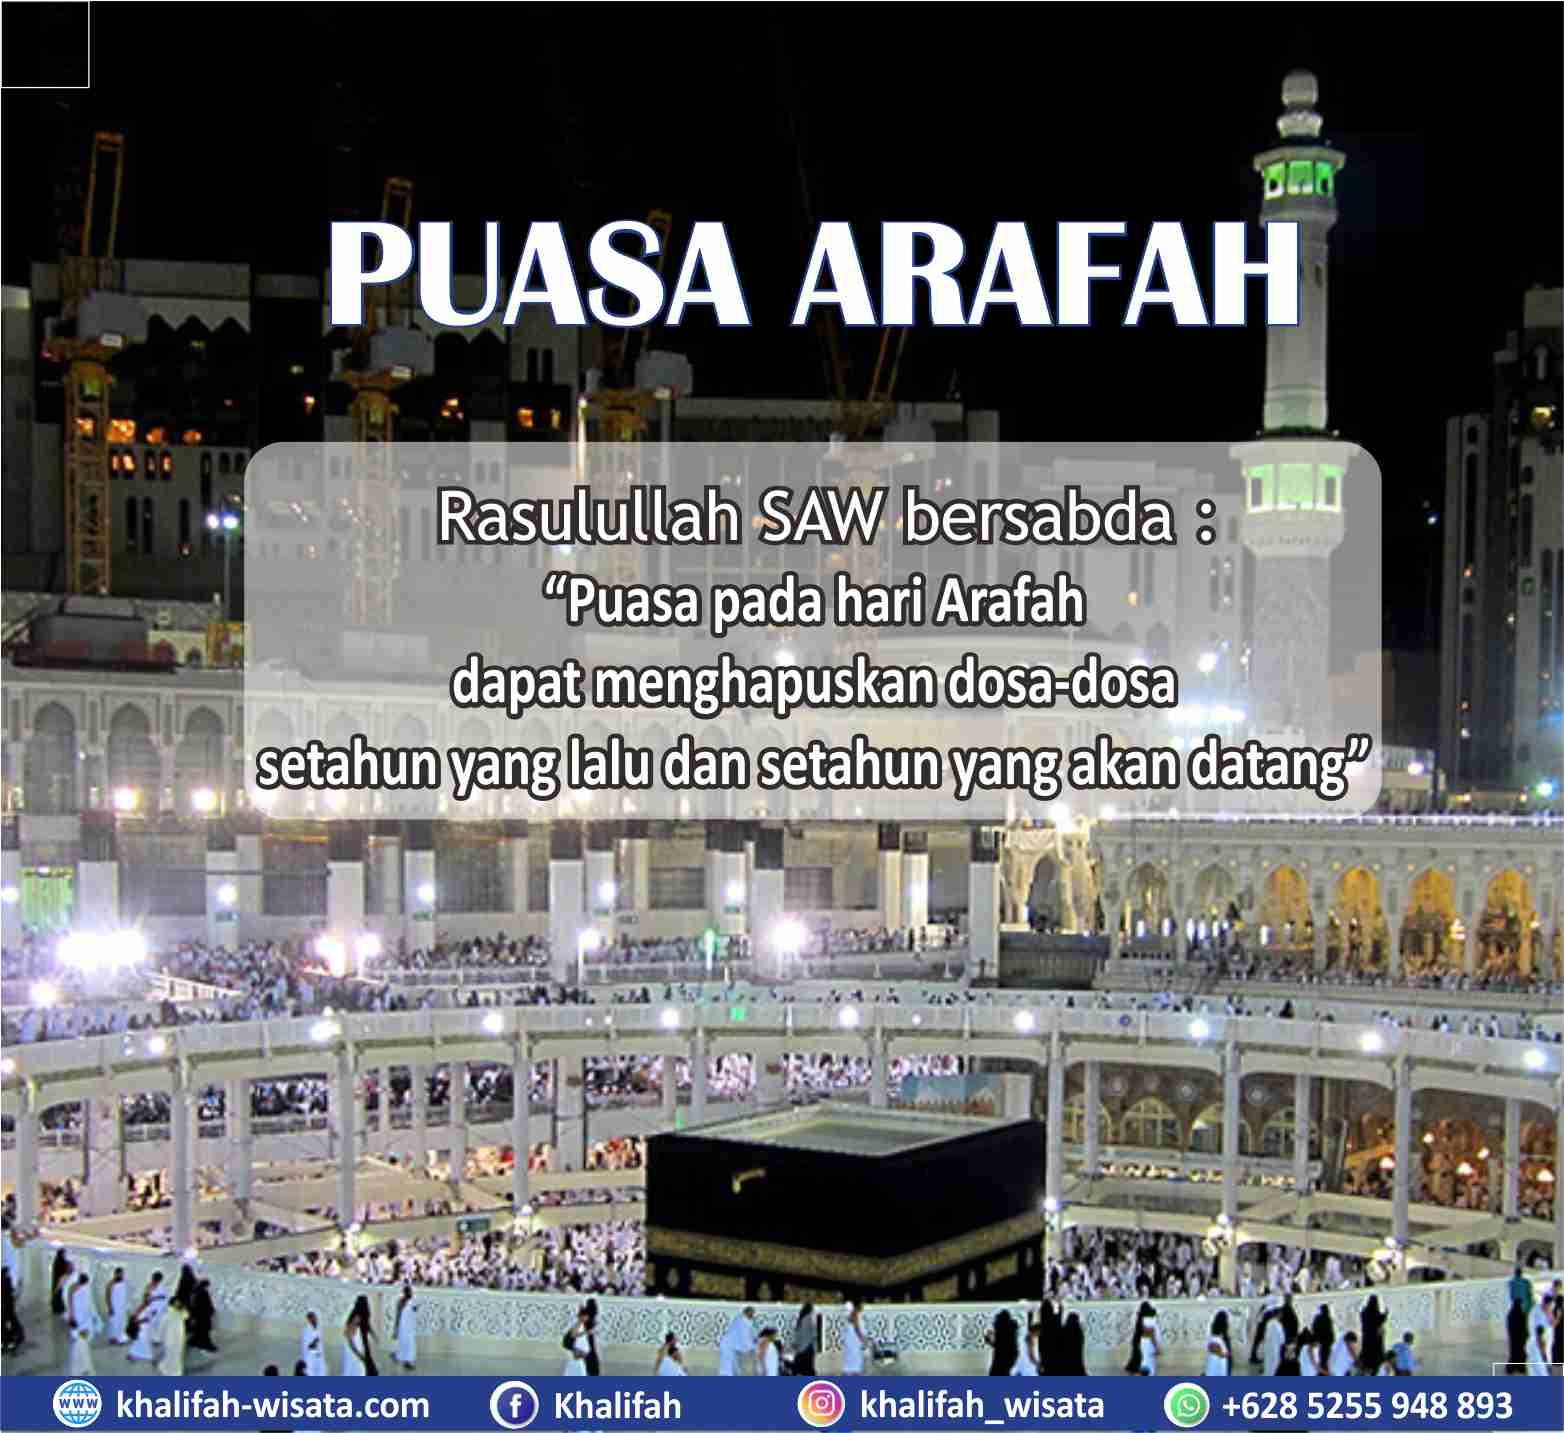 Puasa Arafah 9 Dzulhijjah